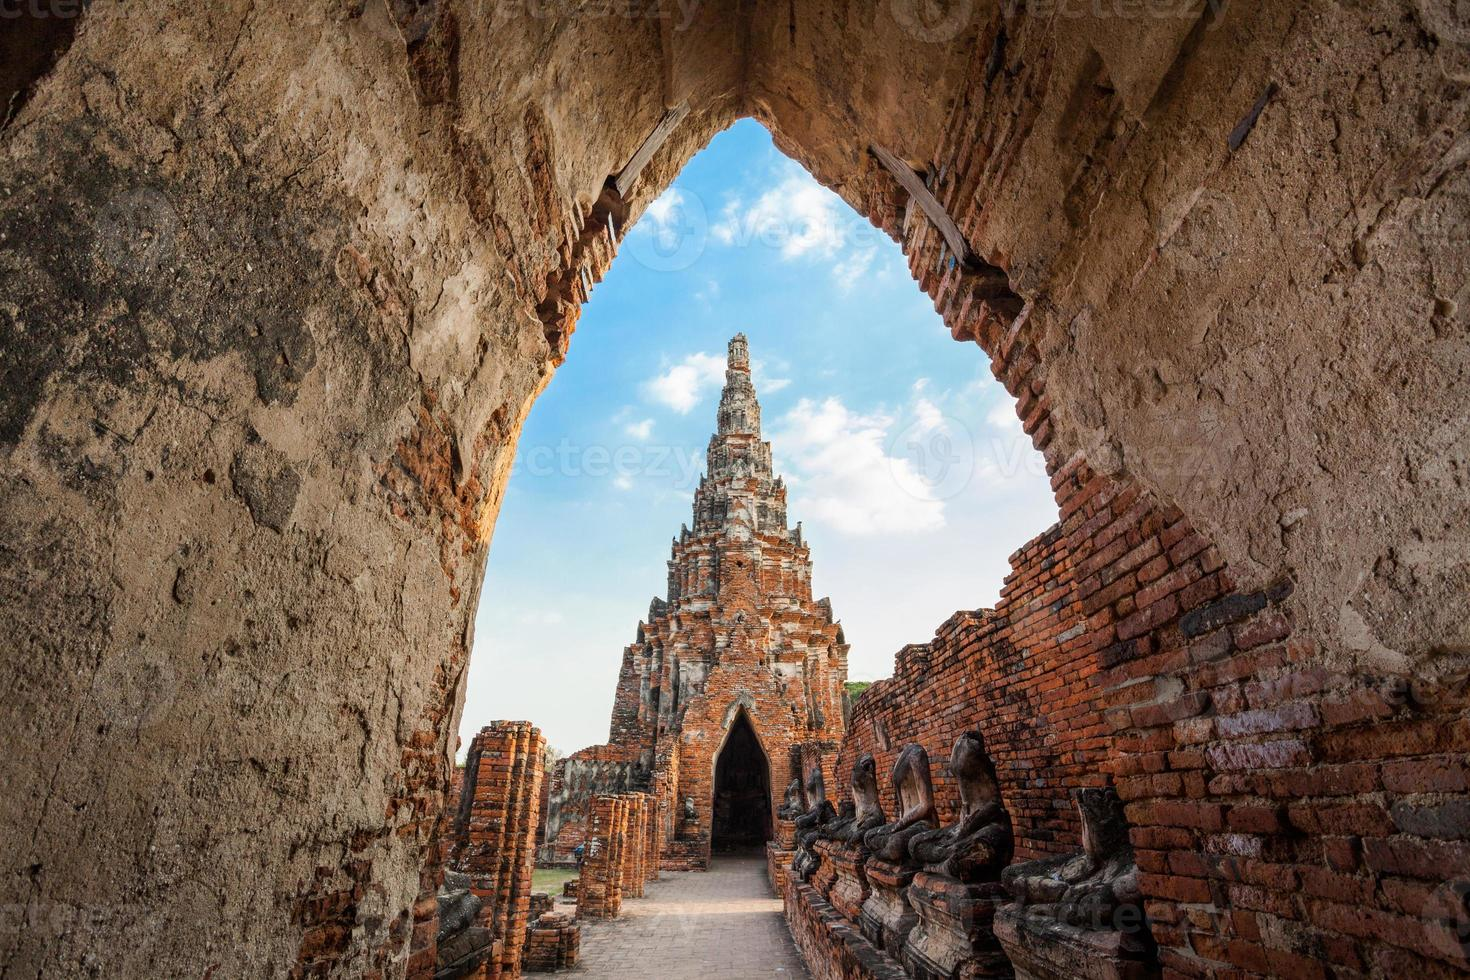 pagode en stoepa tempel in de oude stad foto